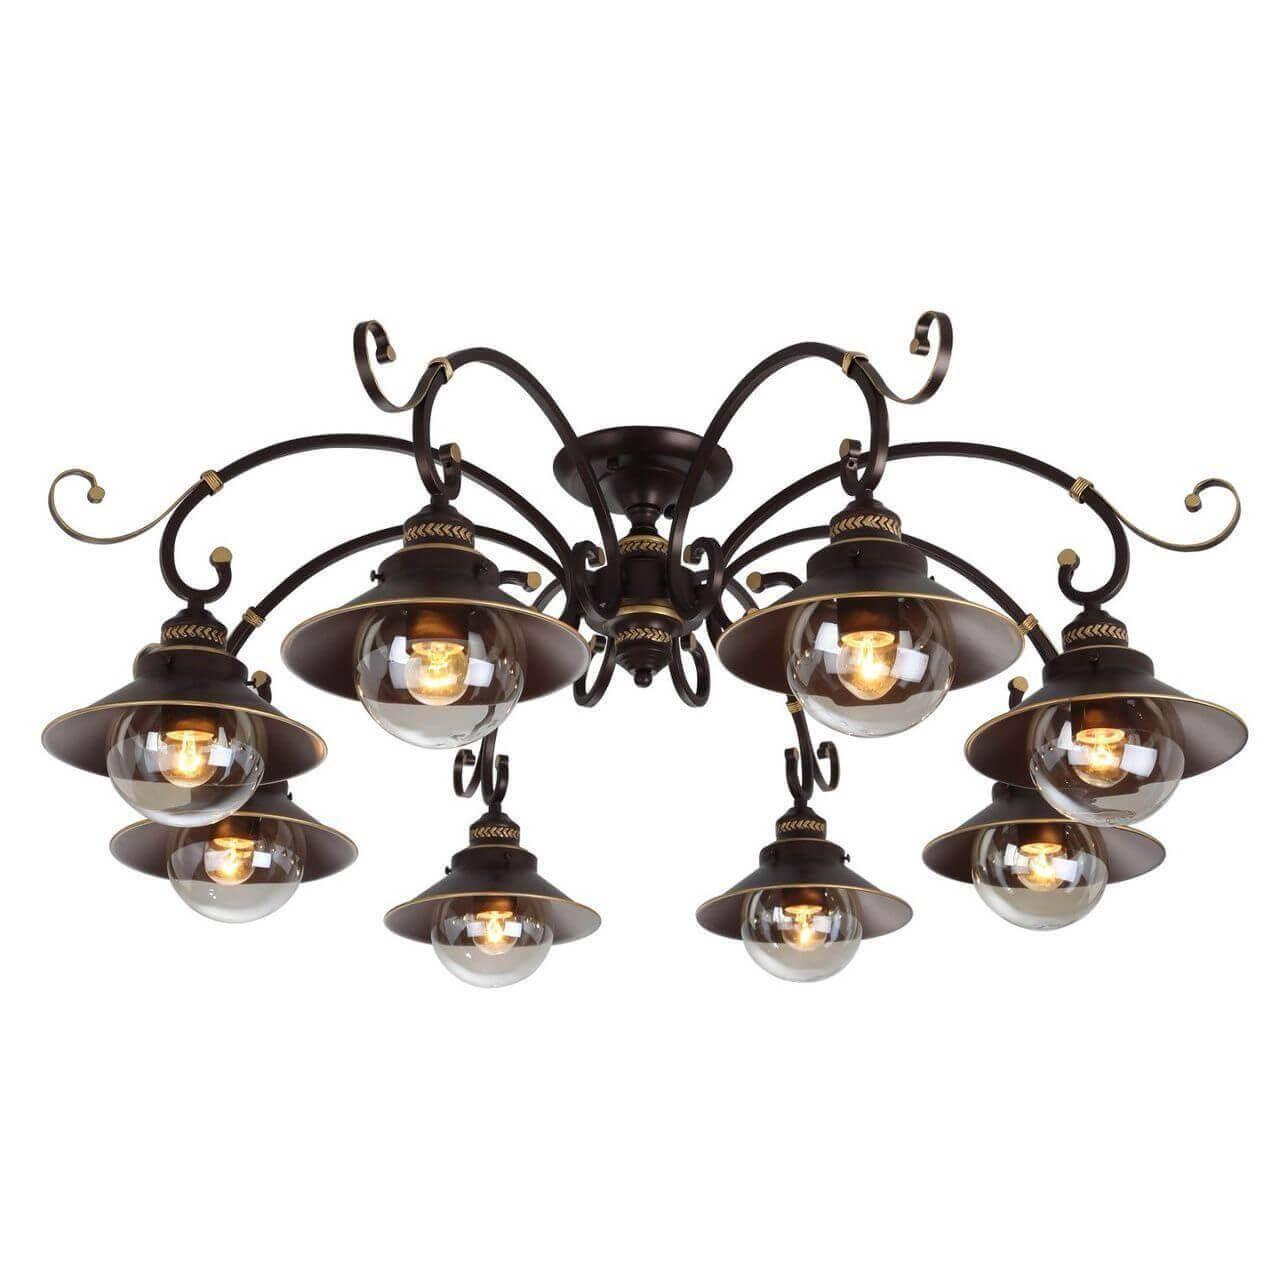 Потолочная люстра Arte Lamp 7 A4577PL-8CK